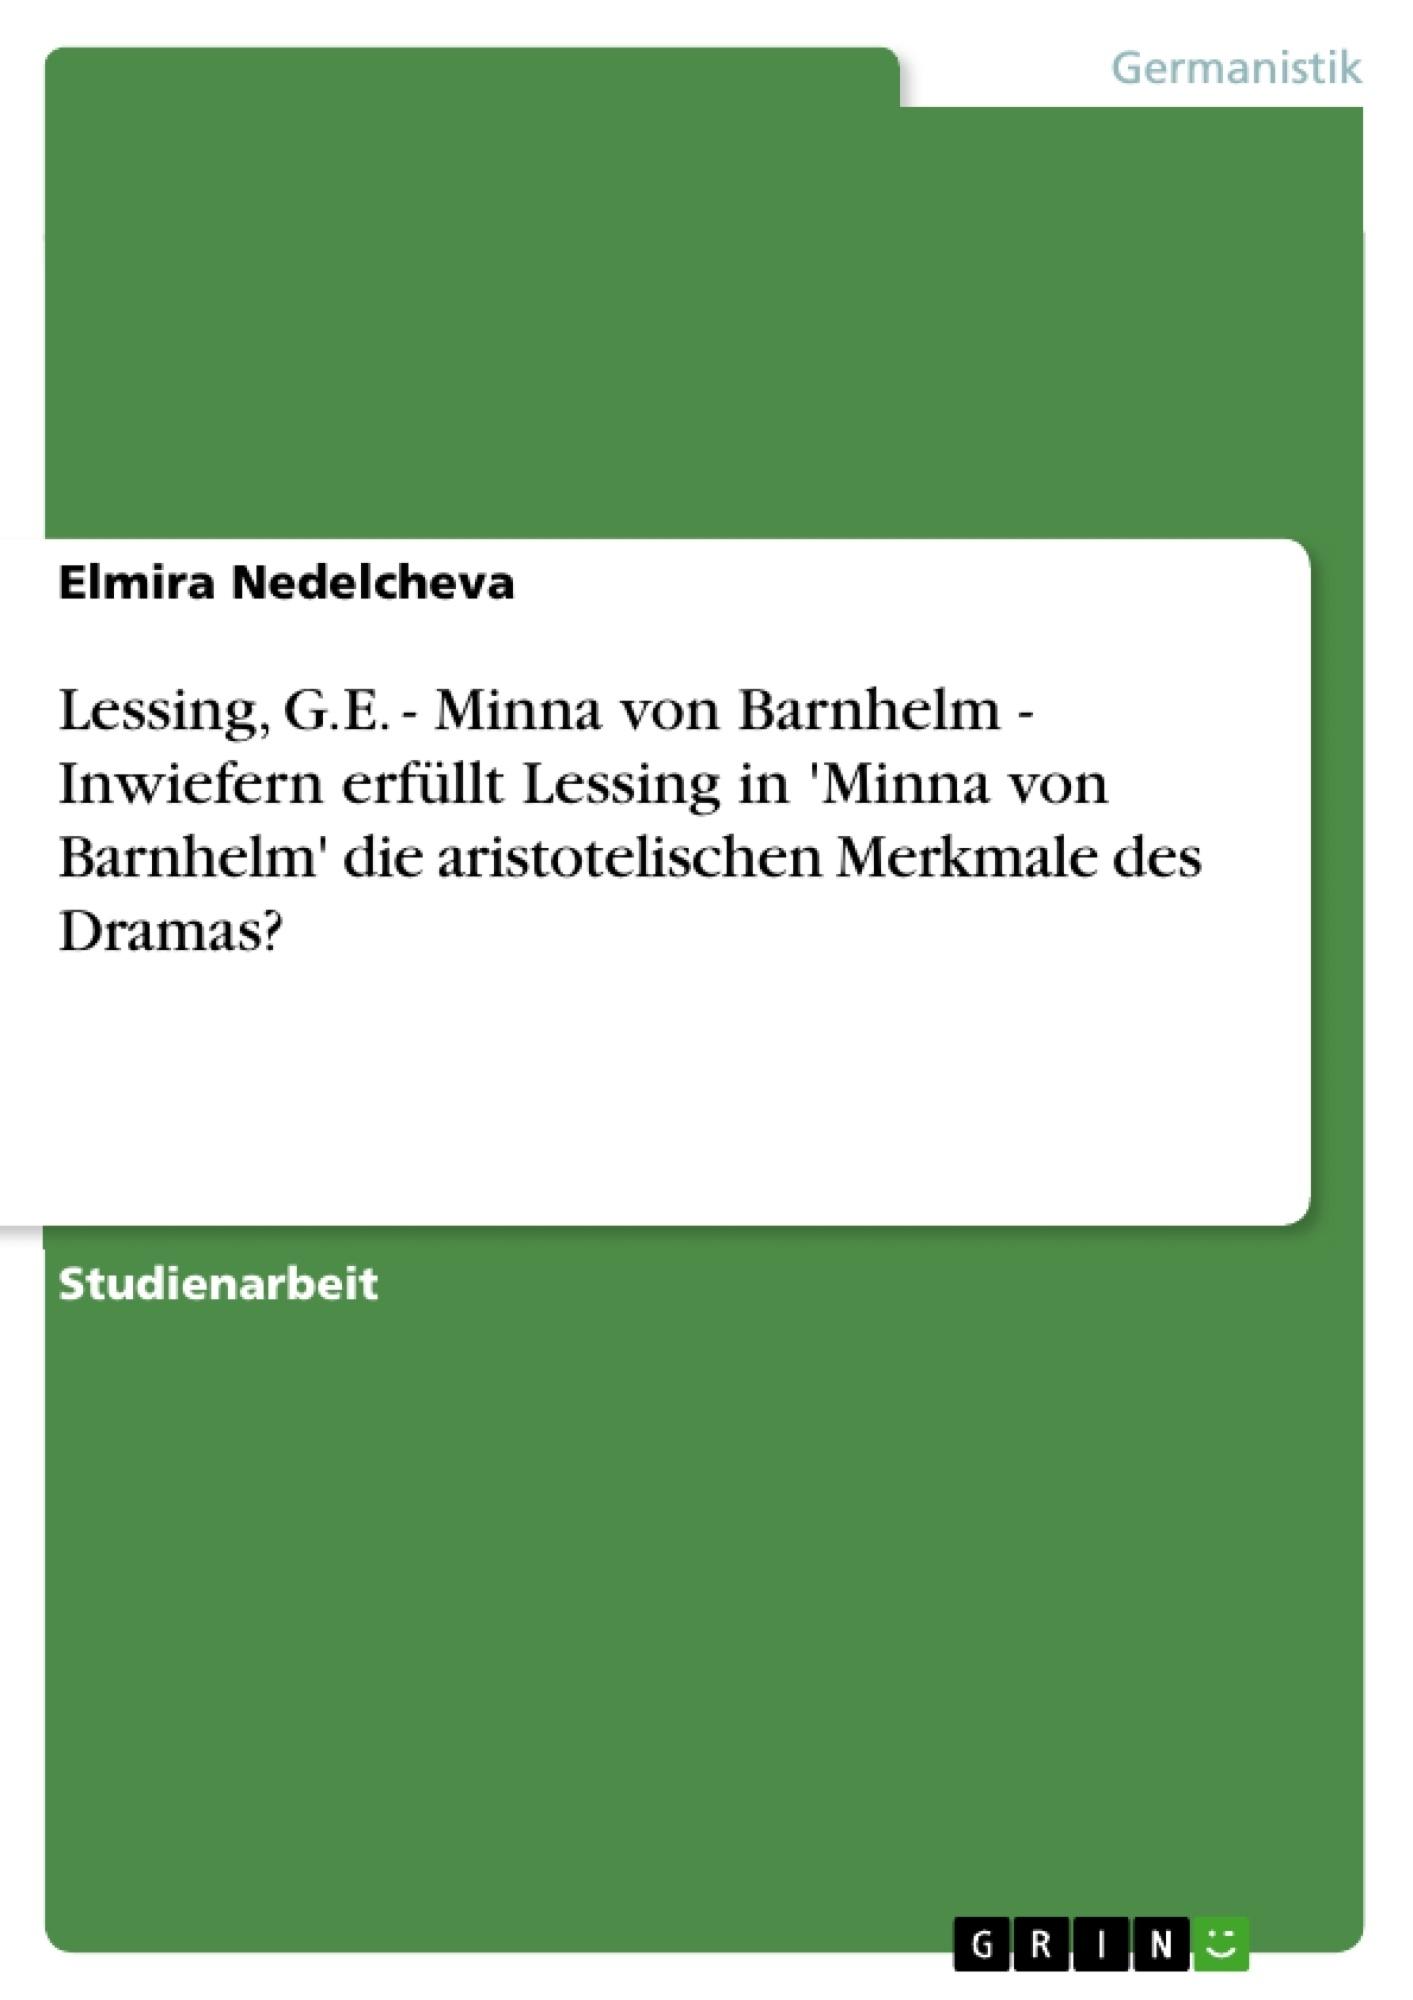 Titel: Lessing, G.E. - Minna von Barnhelm - Inwiefern erfüllt Lessing in 'Minna von Barnhelm'   die aristotelischen Merkmale des Dramas?